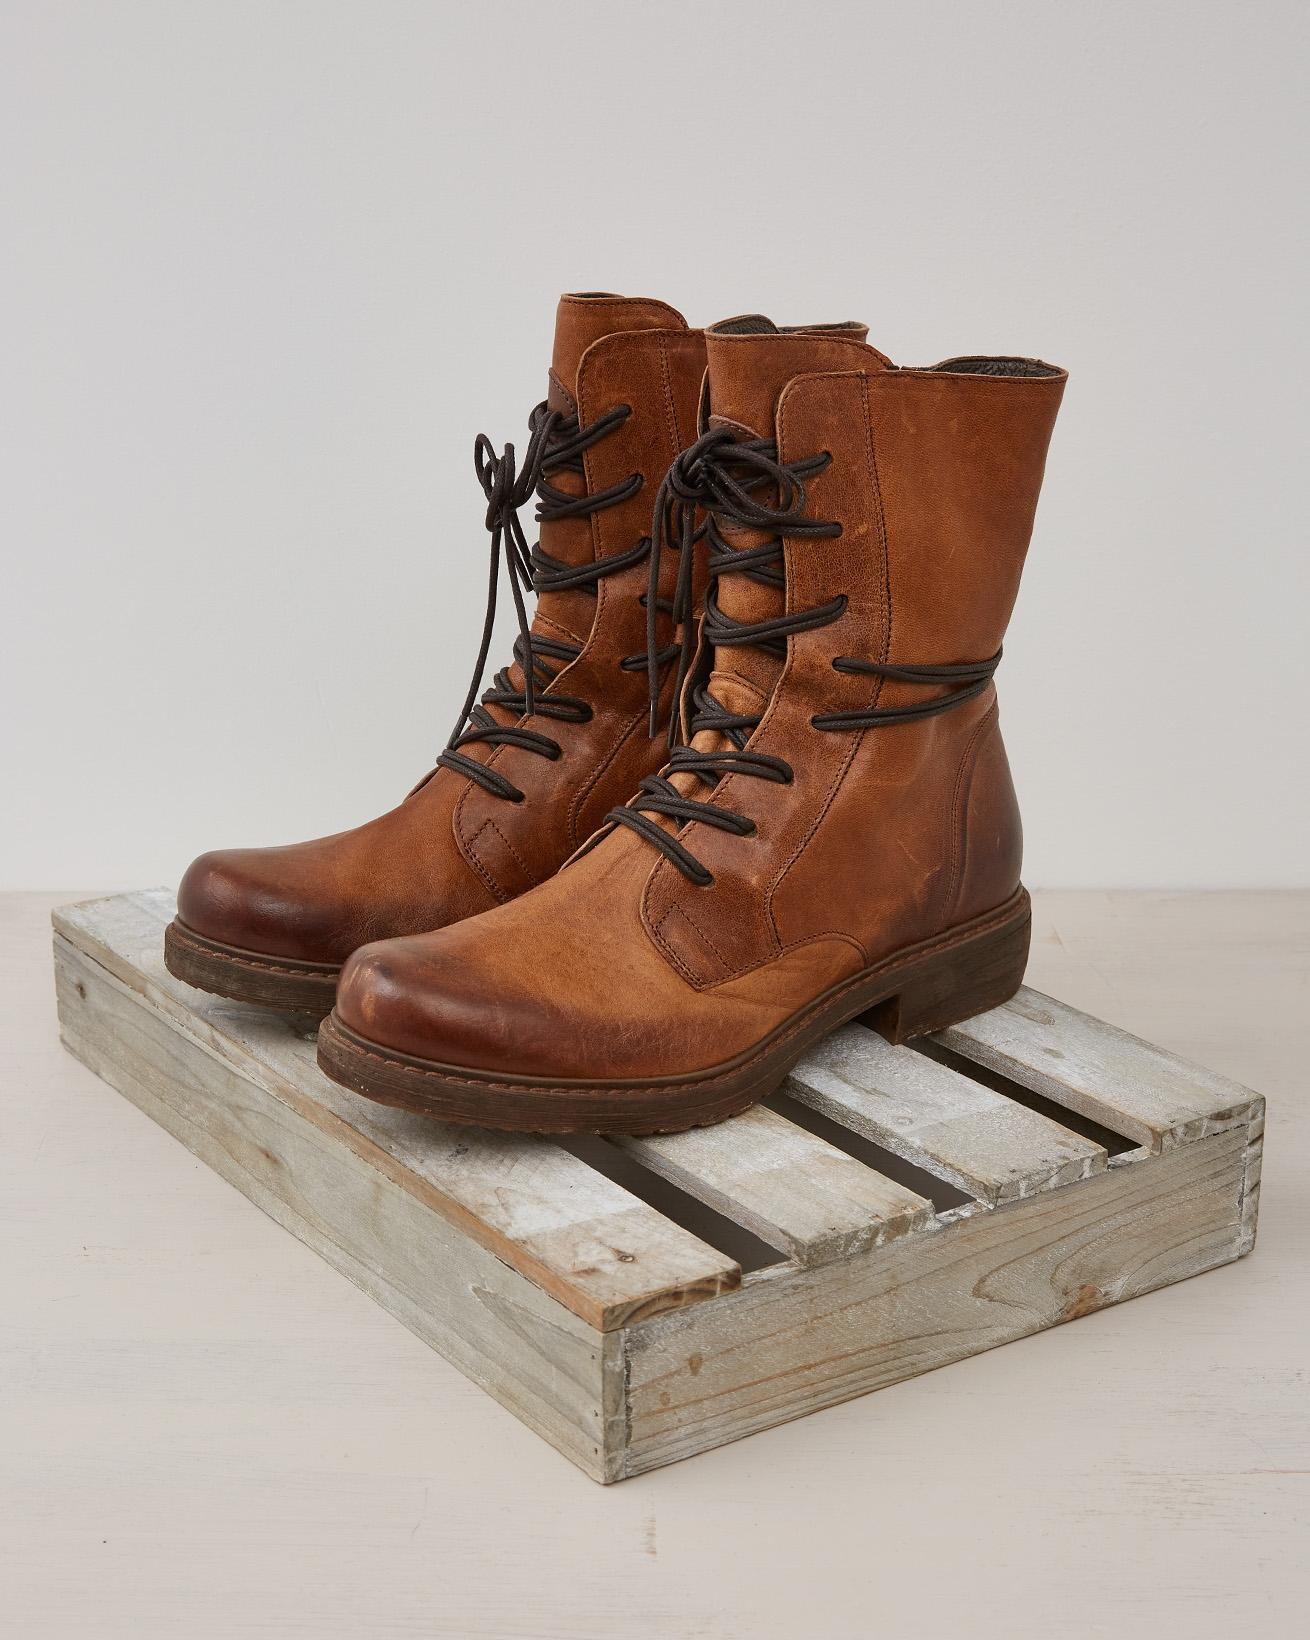 Derby Boot - Antique Brown - Size 40 - 2443